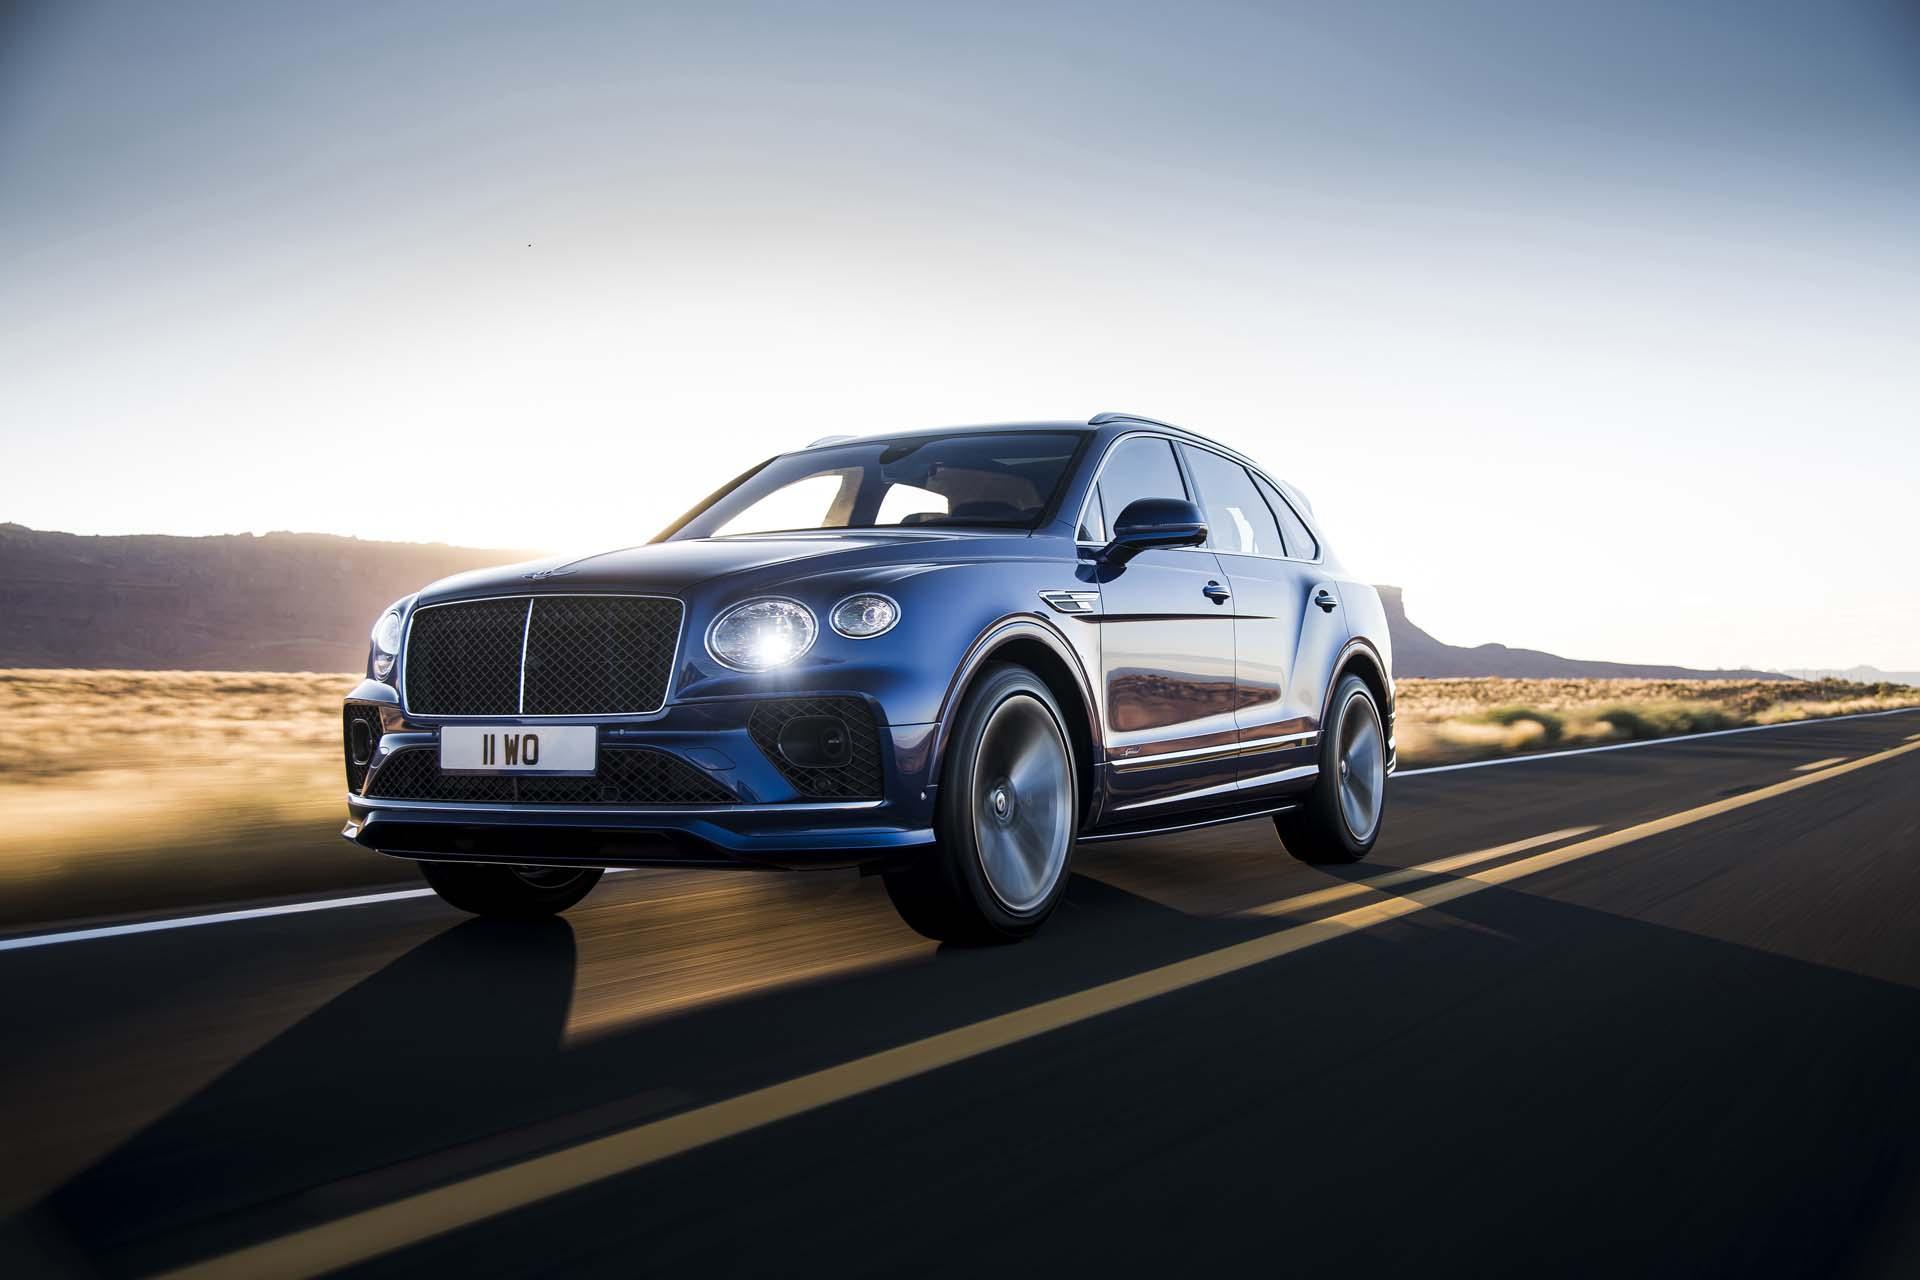 2021 Bentley Bentayga Speed Brings New Looks And Added Refinement